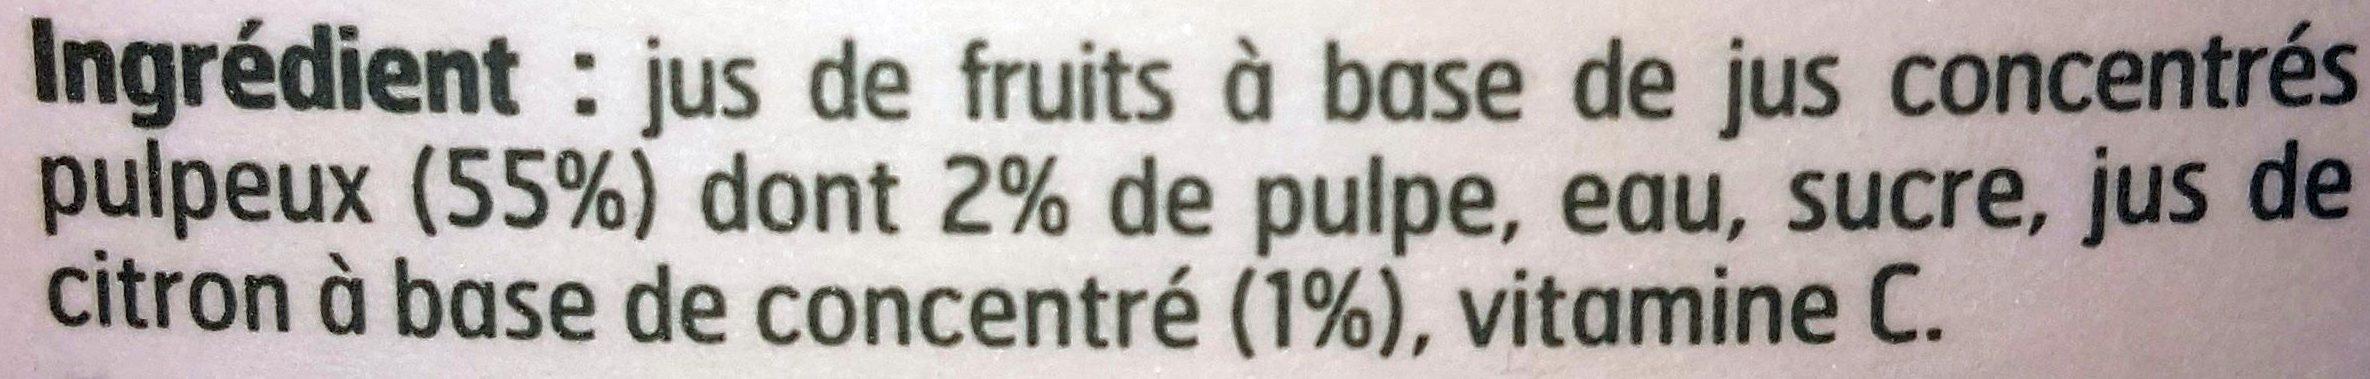 Nectar d'orange - Ingrédients - fr